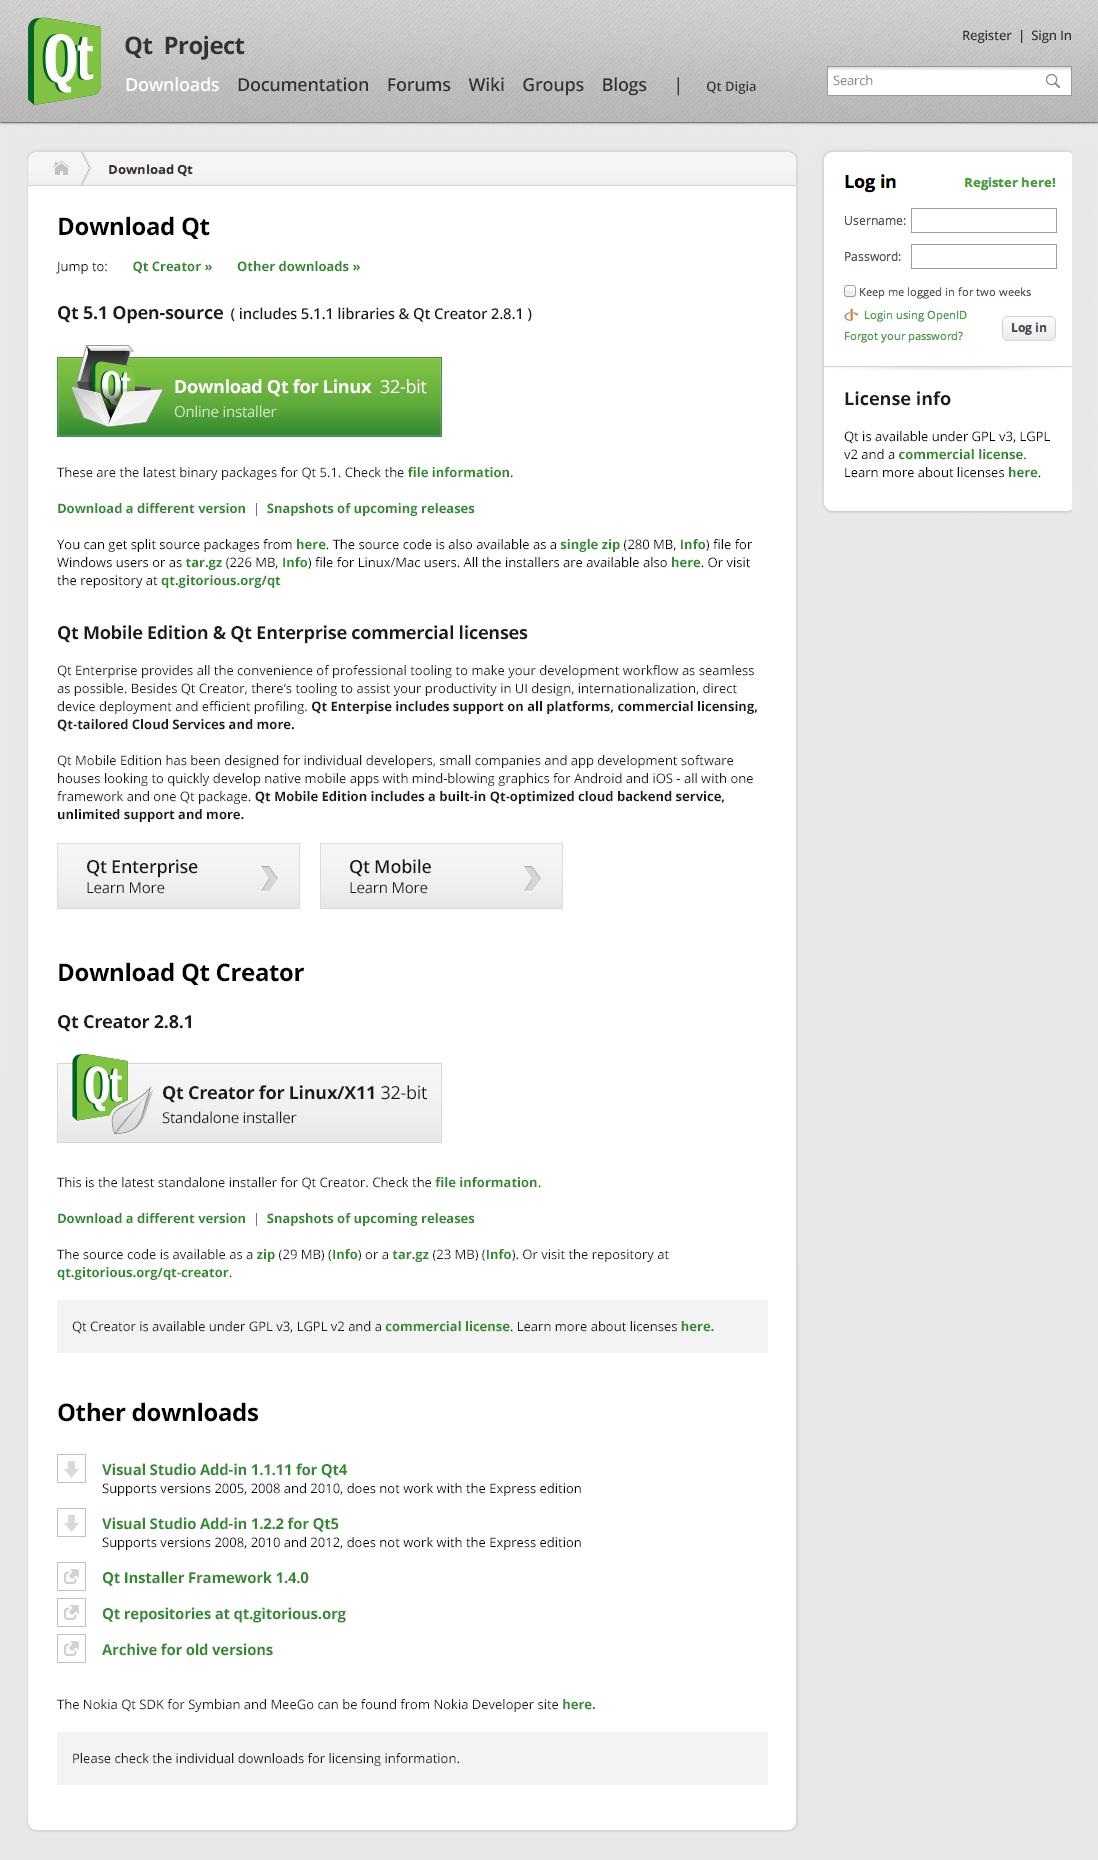 QTWEBSITE-543] Download page redesign - Qt Bug Tracker